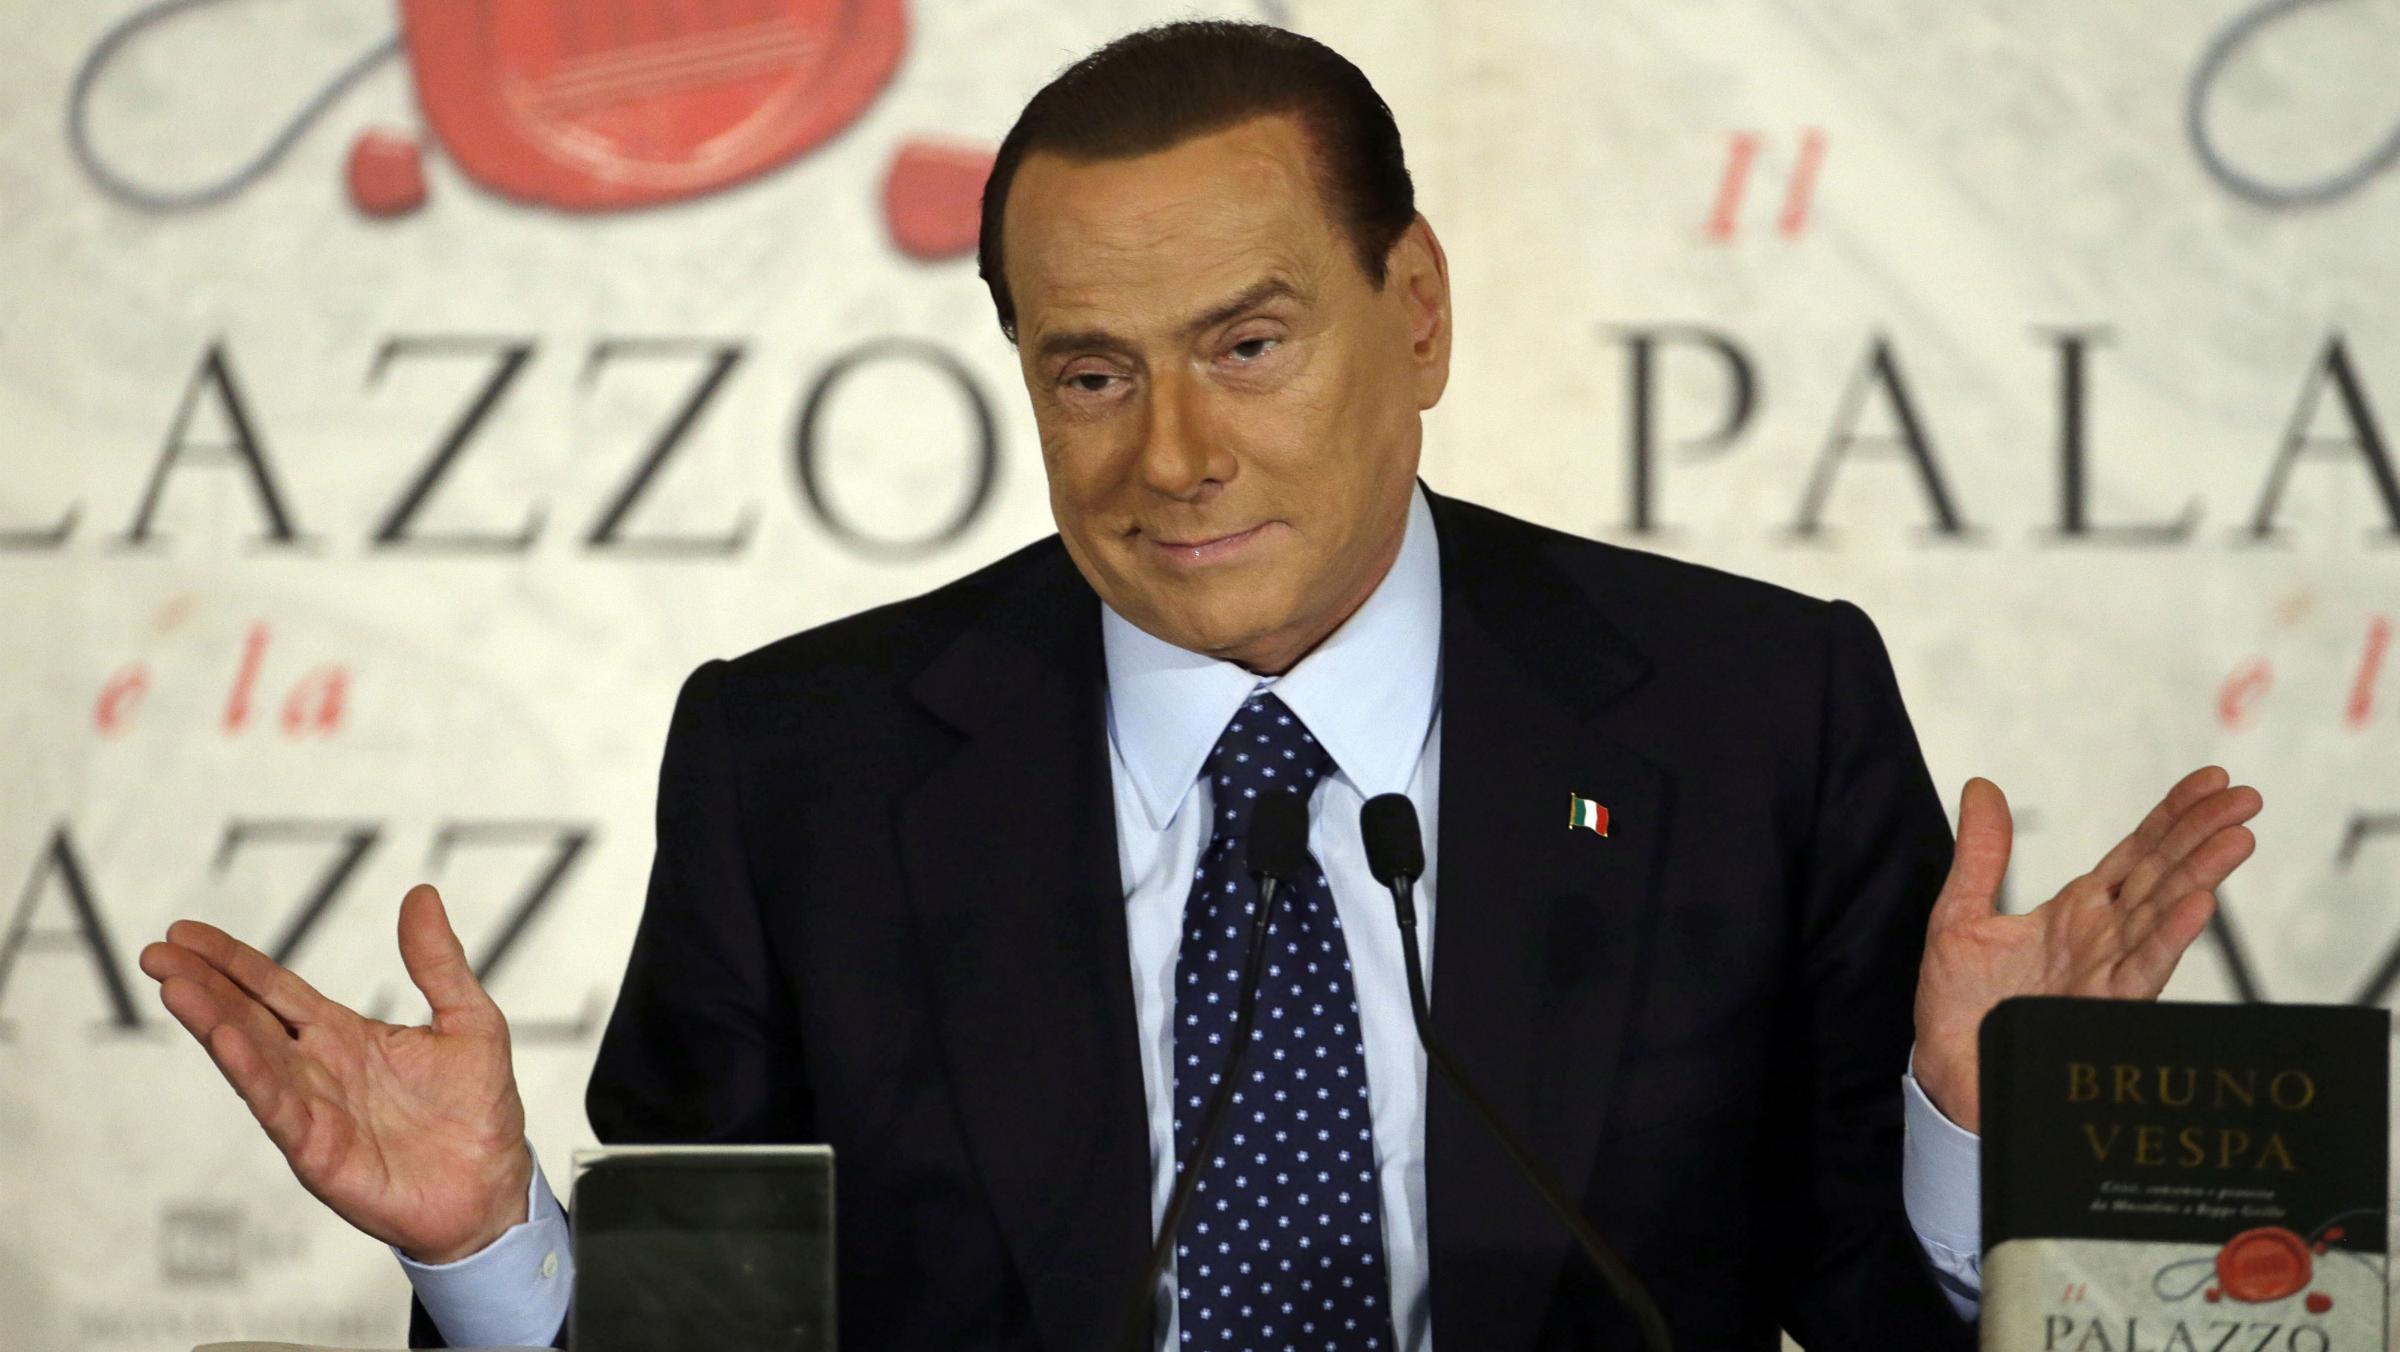 silvio berlusconi italy elections hung parliament